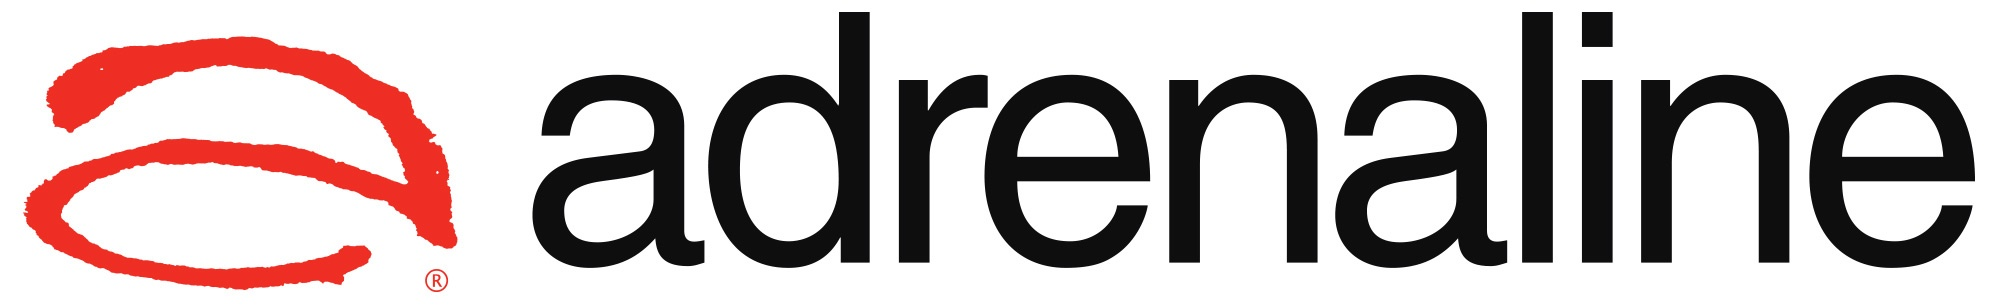 01_adrenaline-horizontal_logo.jpg